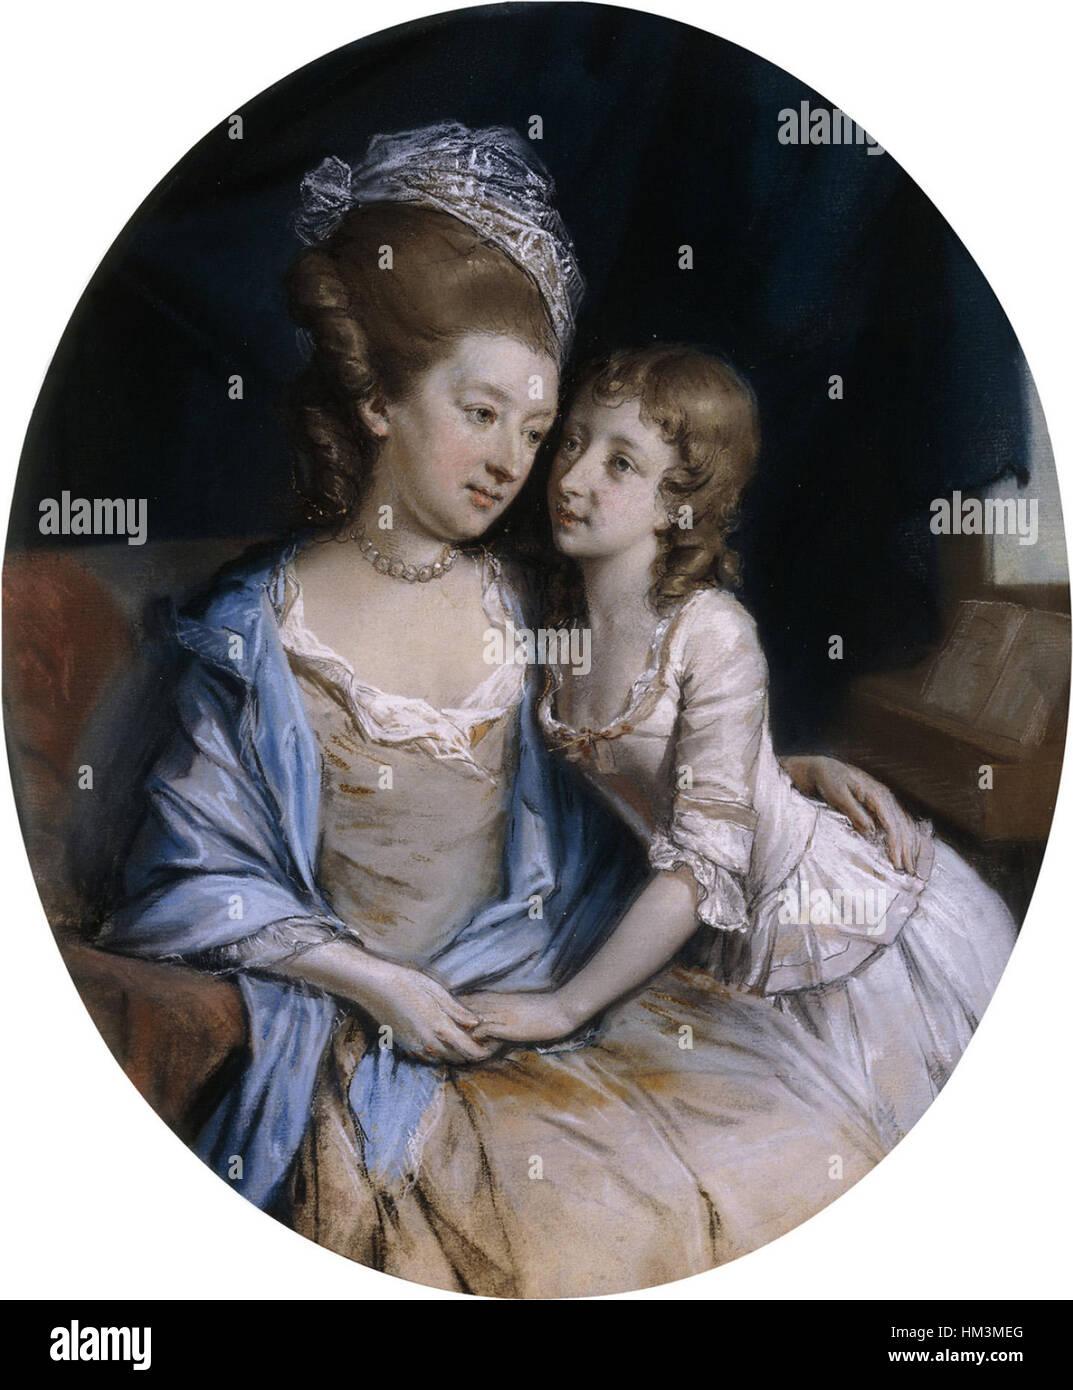 Hugh Douglas Hamilton - Portrait of a Mother and Child - Stock Image